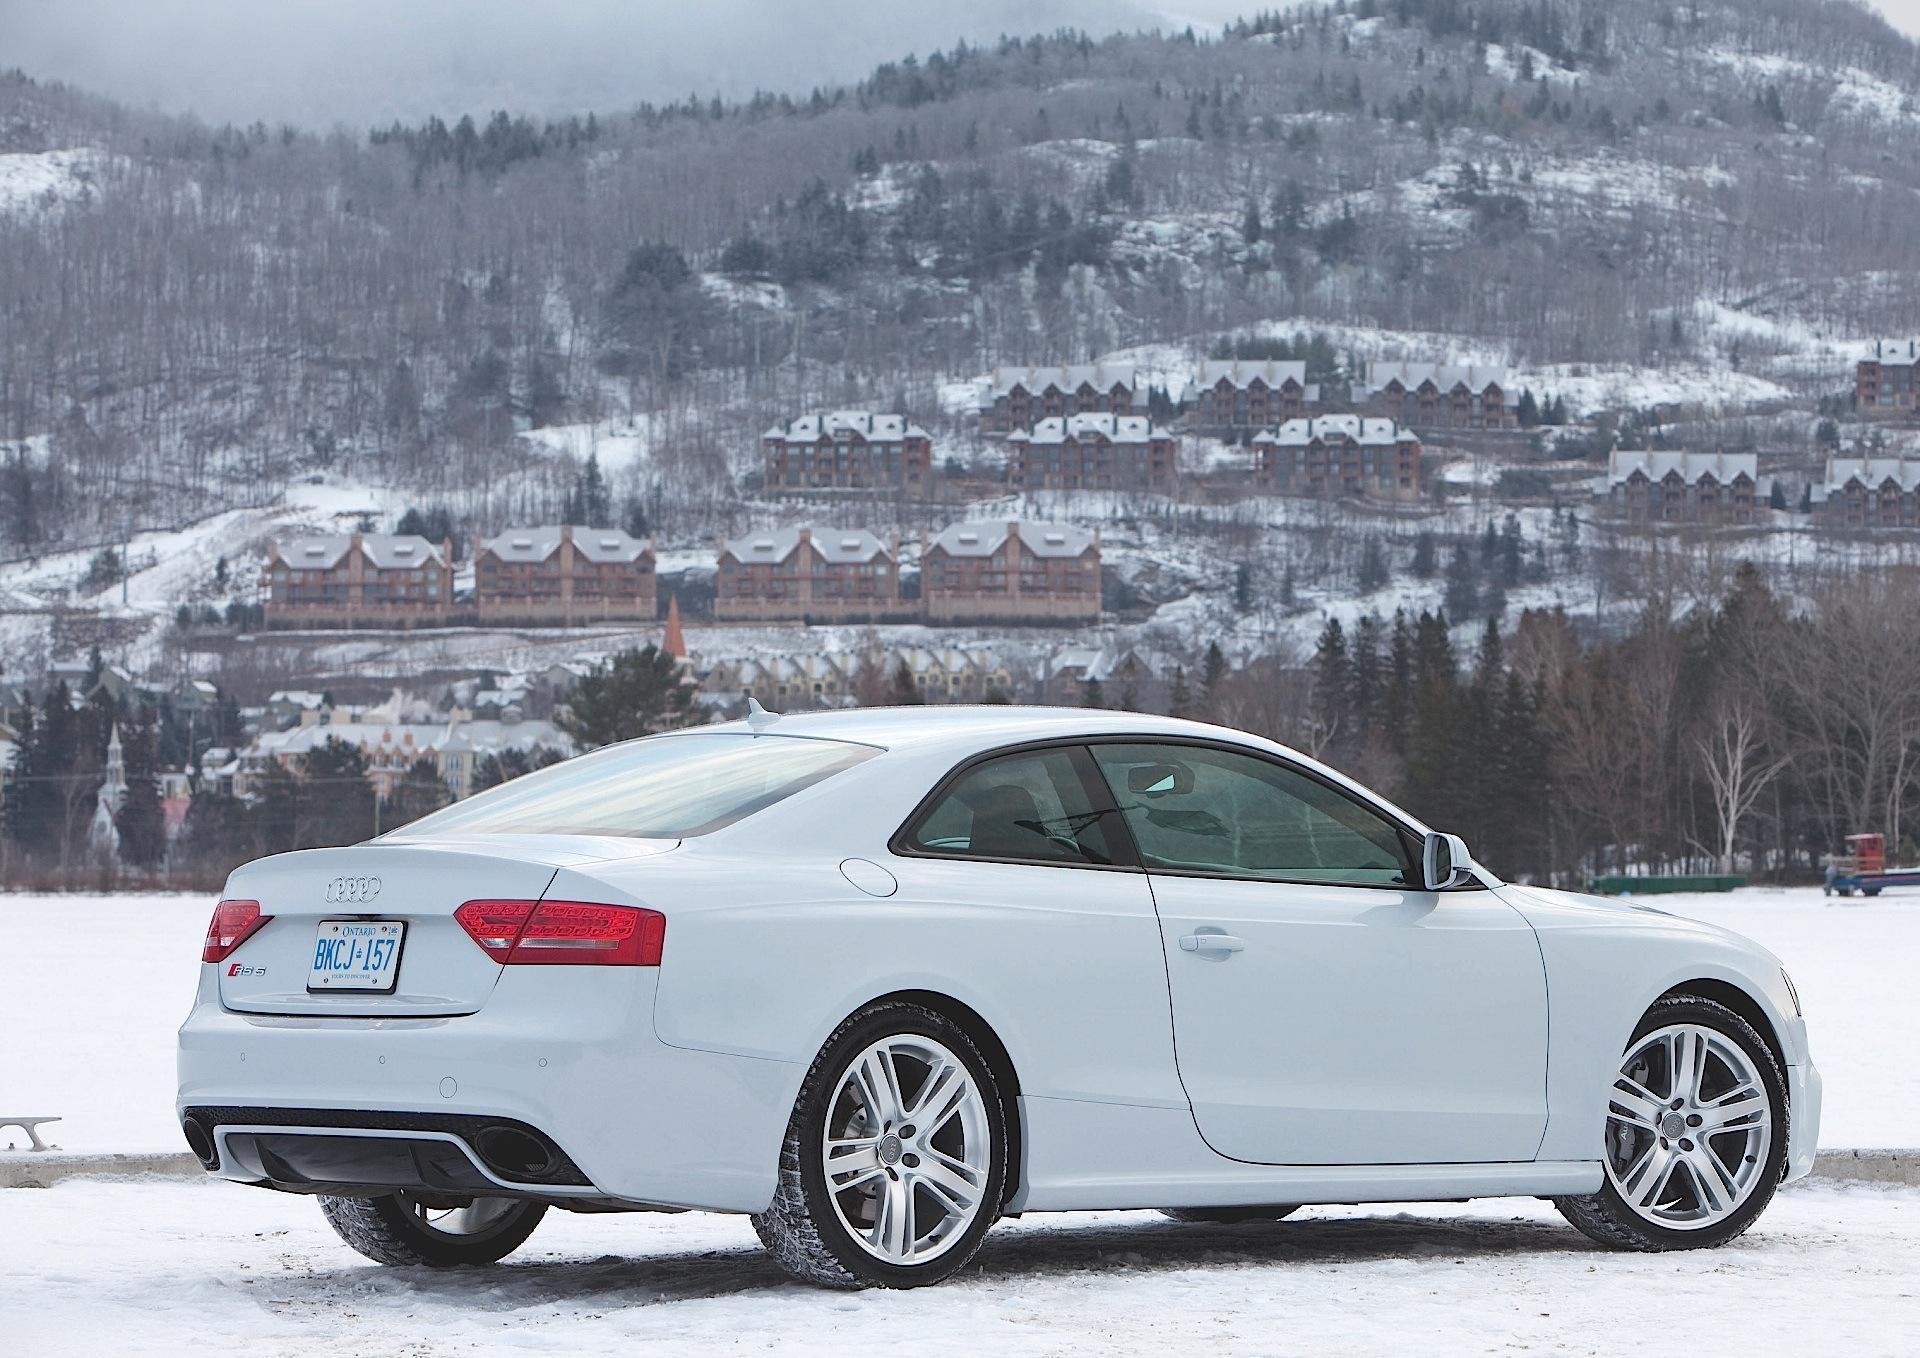 Audi Rs5 Specs Photos 2010 2011 2012 2013 2014 2015 2016 2017 Autoevolution